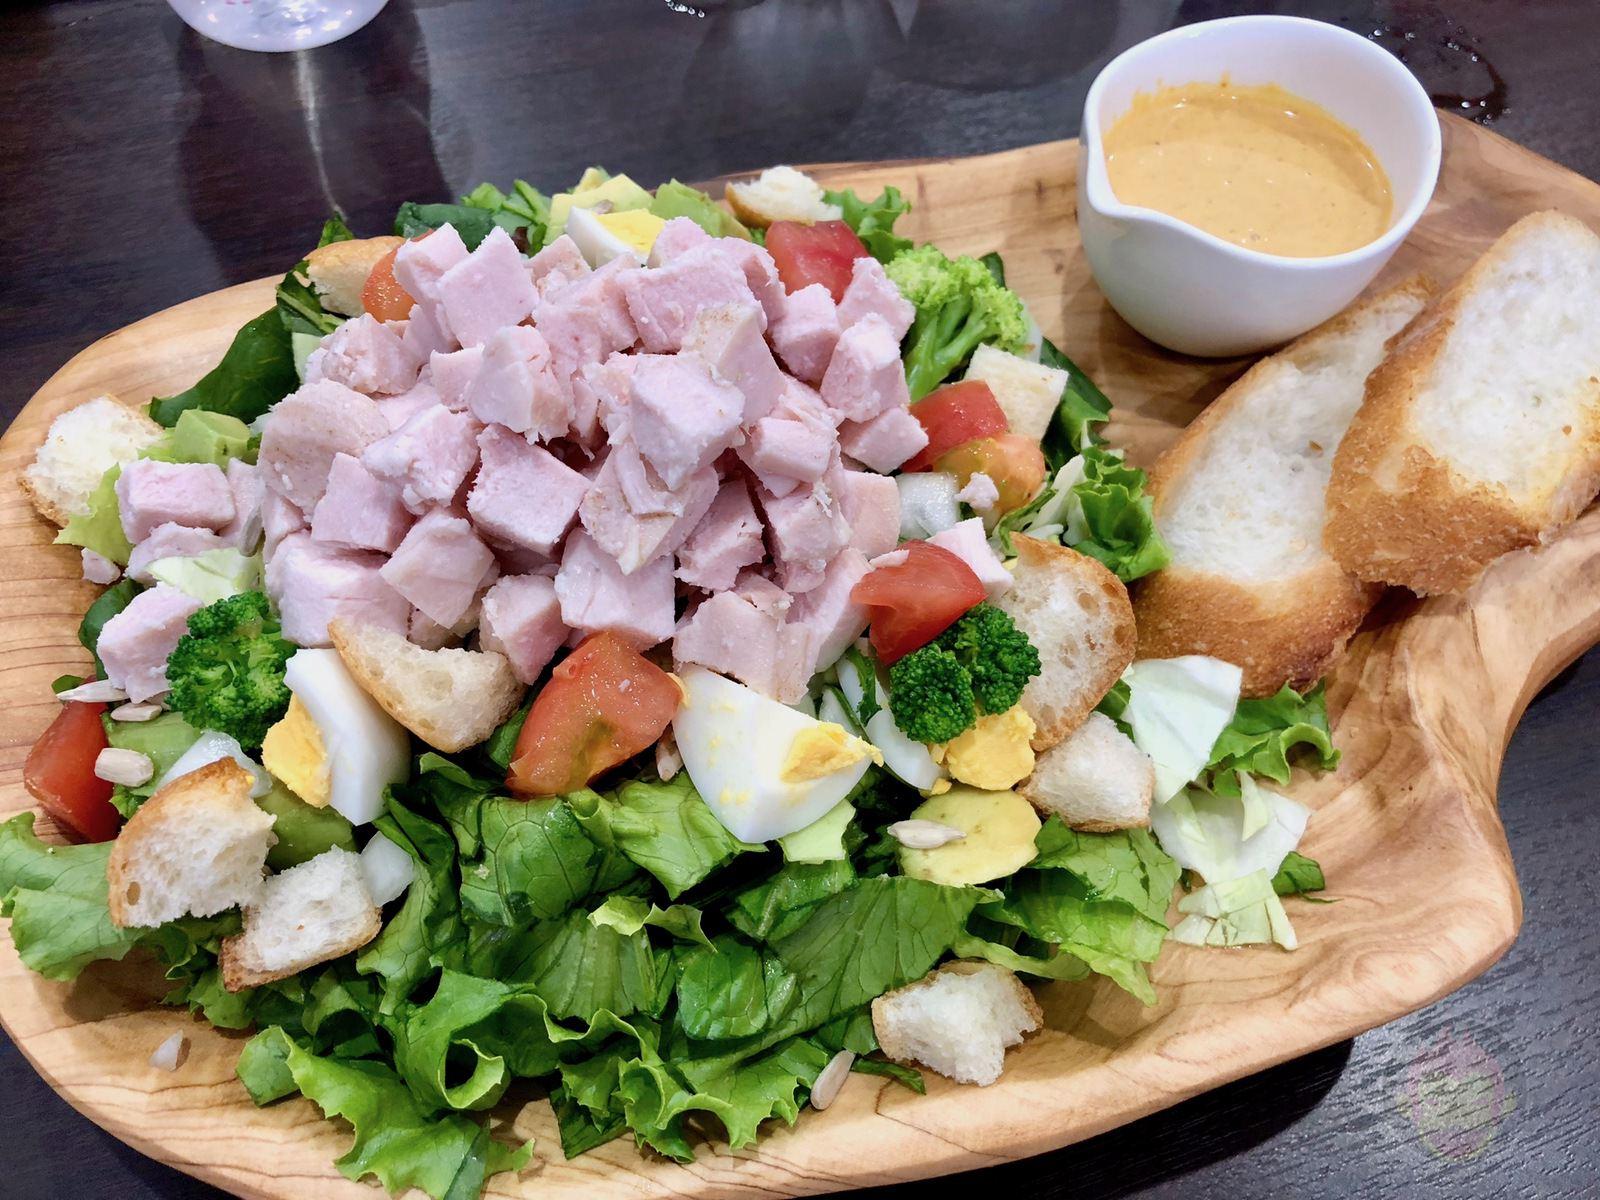 Hundred-Fruits-Salad-and-sweets-11.jpg